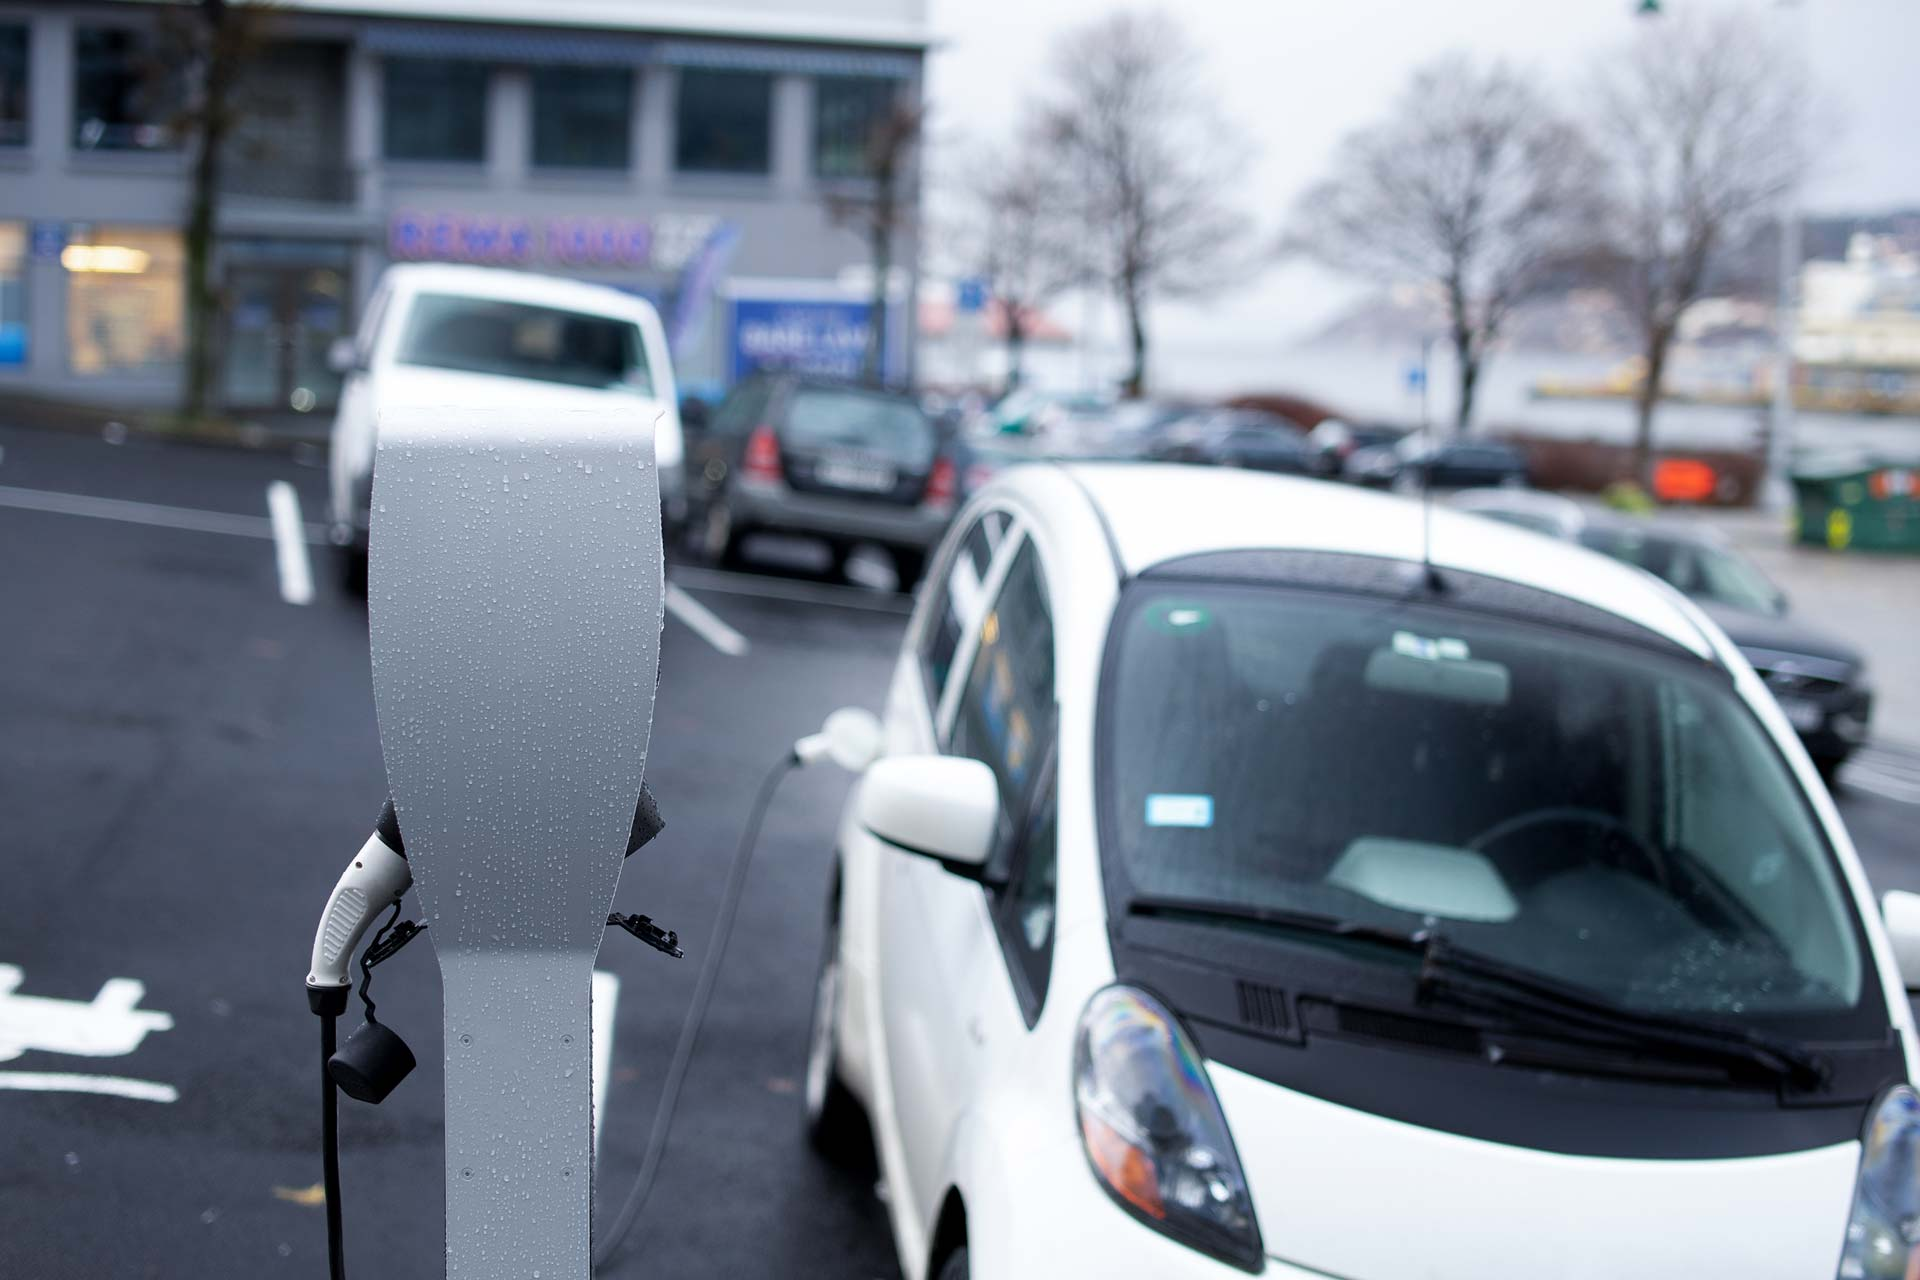 Elbillading i Bergen kommune, offentlig parkeringsplass, ZAPTEC, bilkraft app